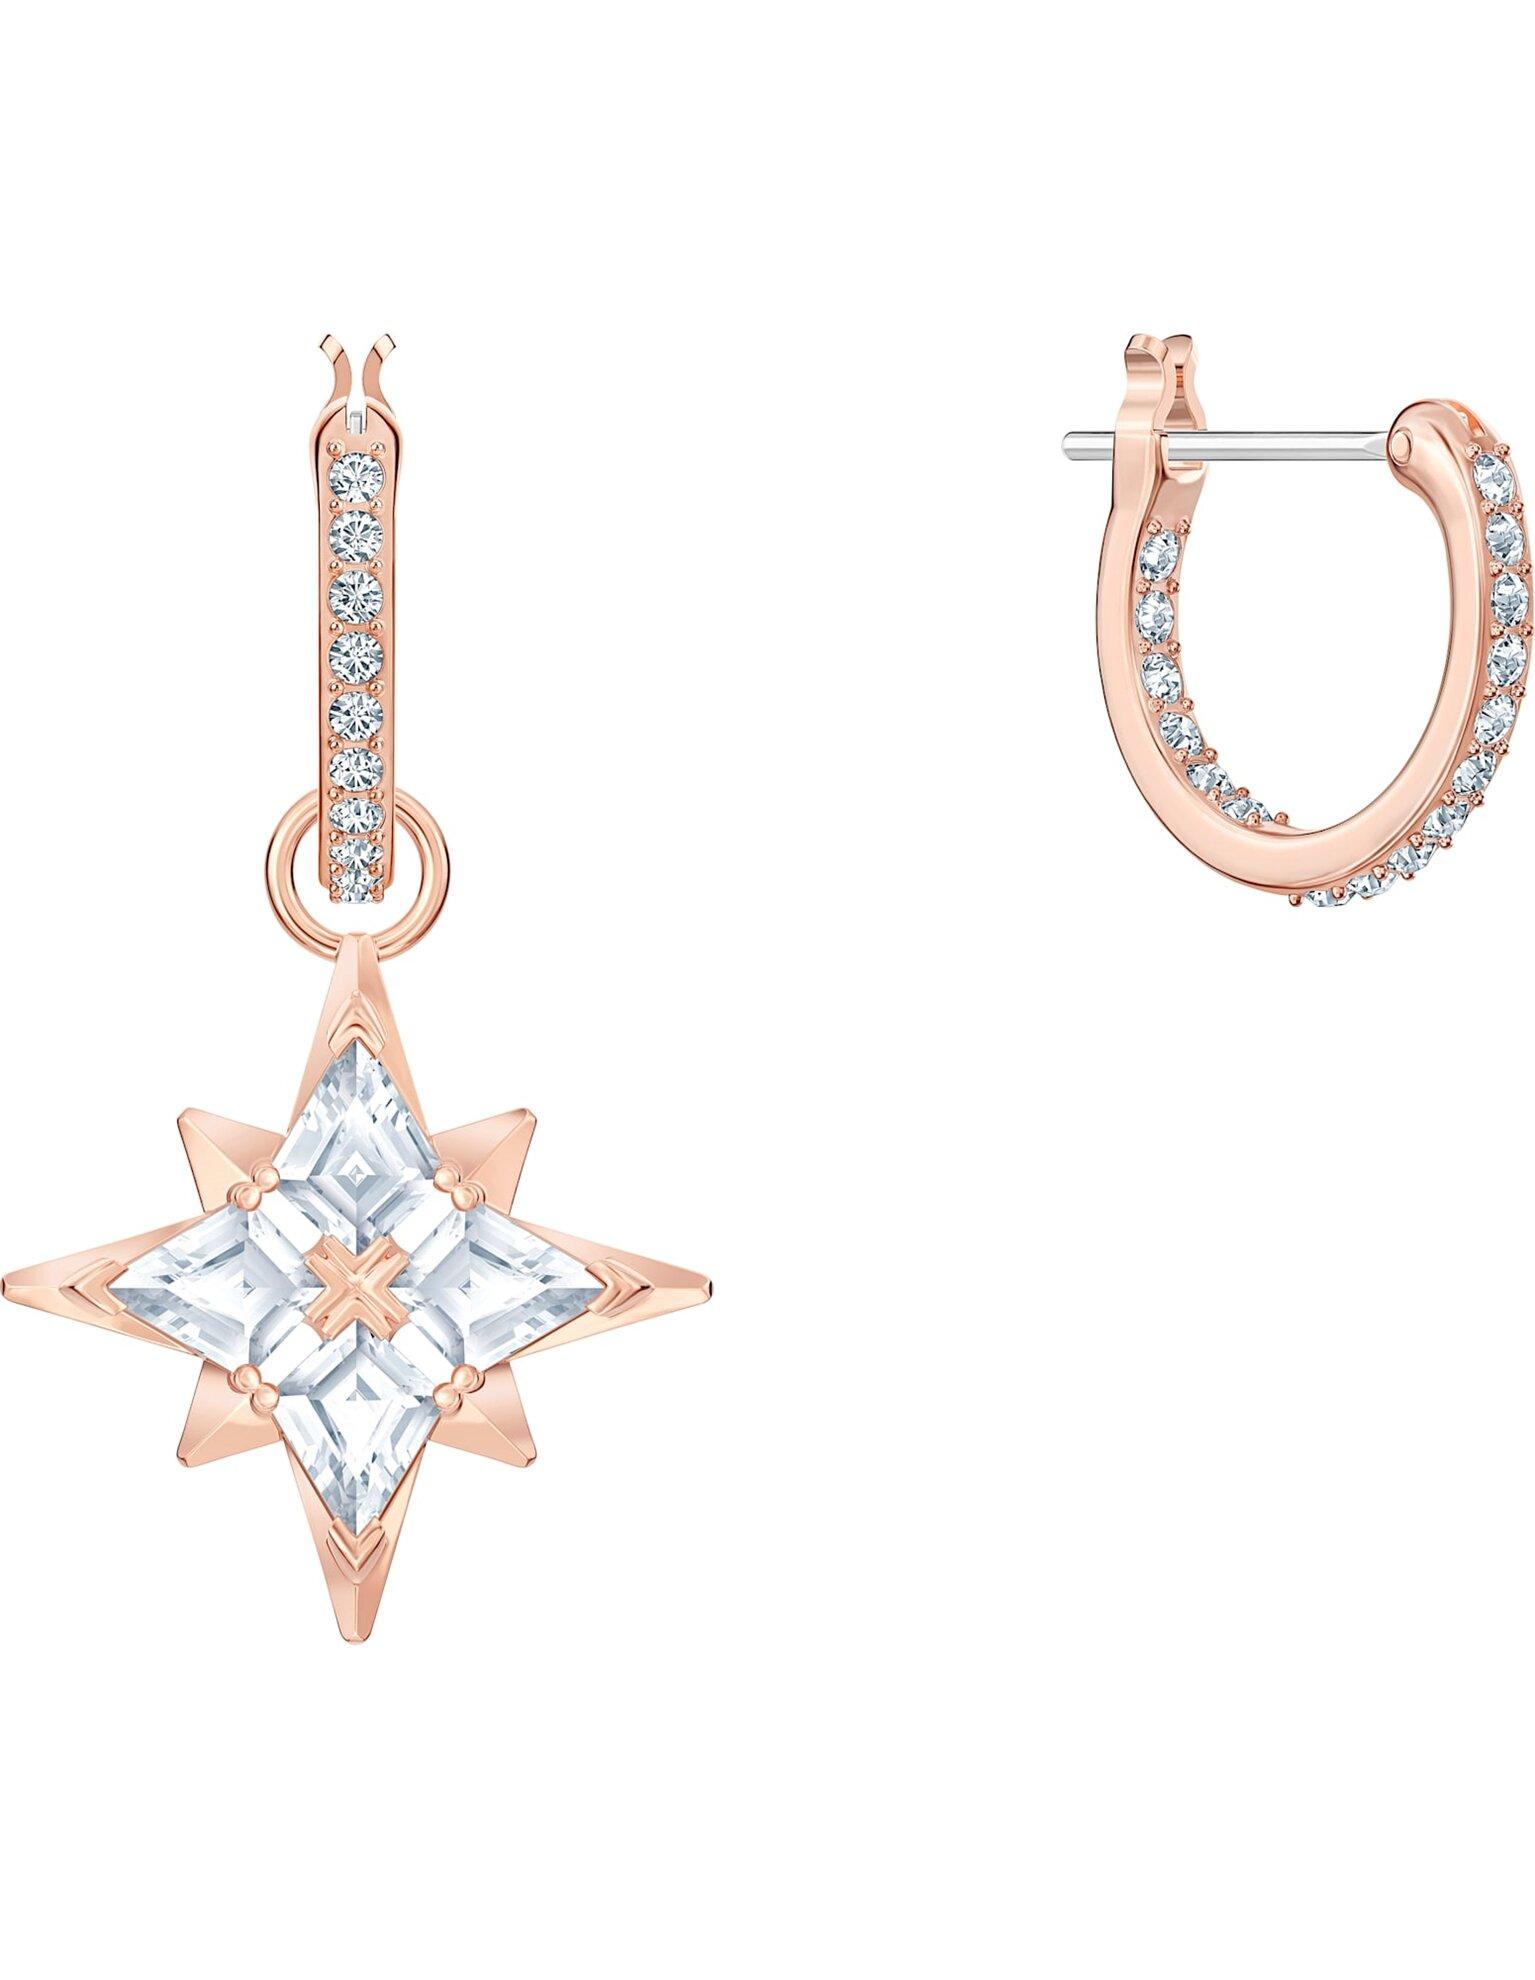 Picture of Swarovski Symbolic Star Halka Küpeler, Beyaz, Pembe altın rengi kaplama